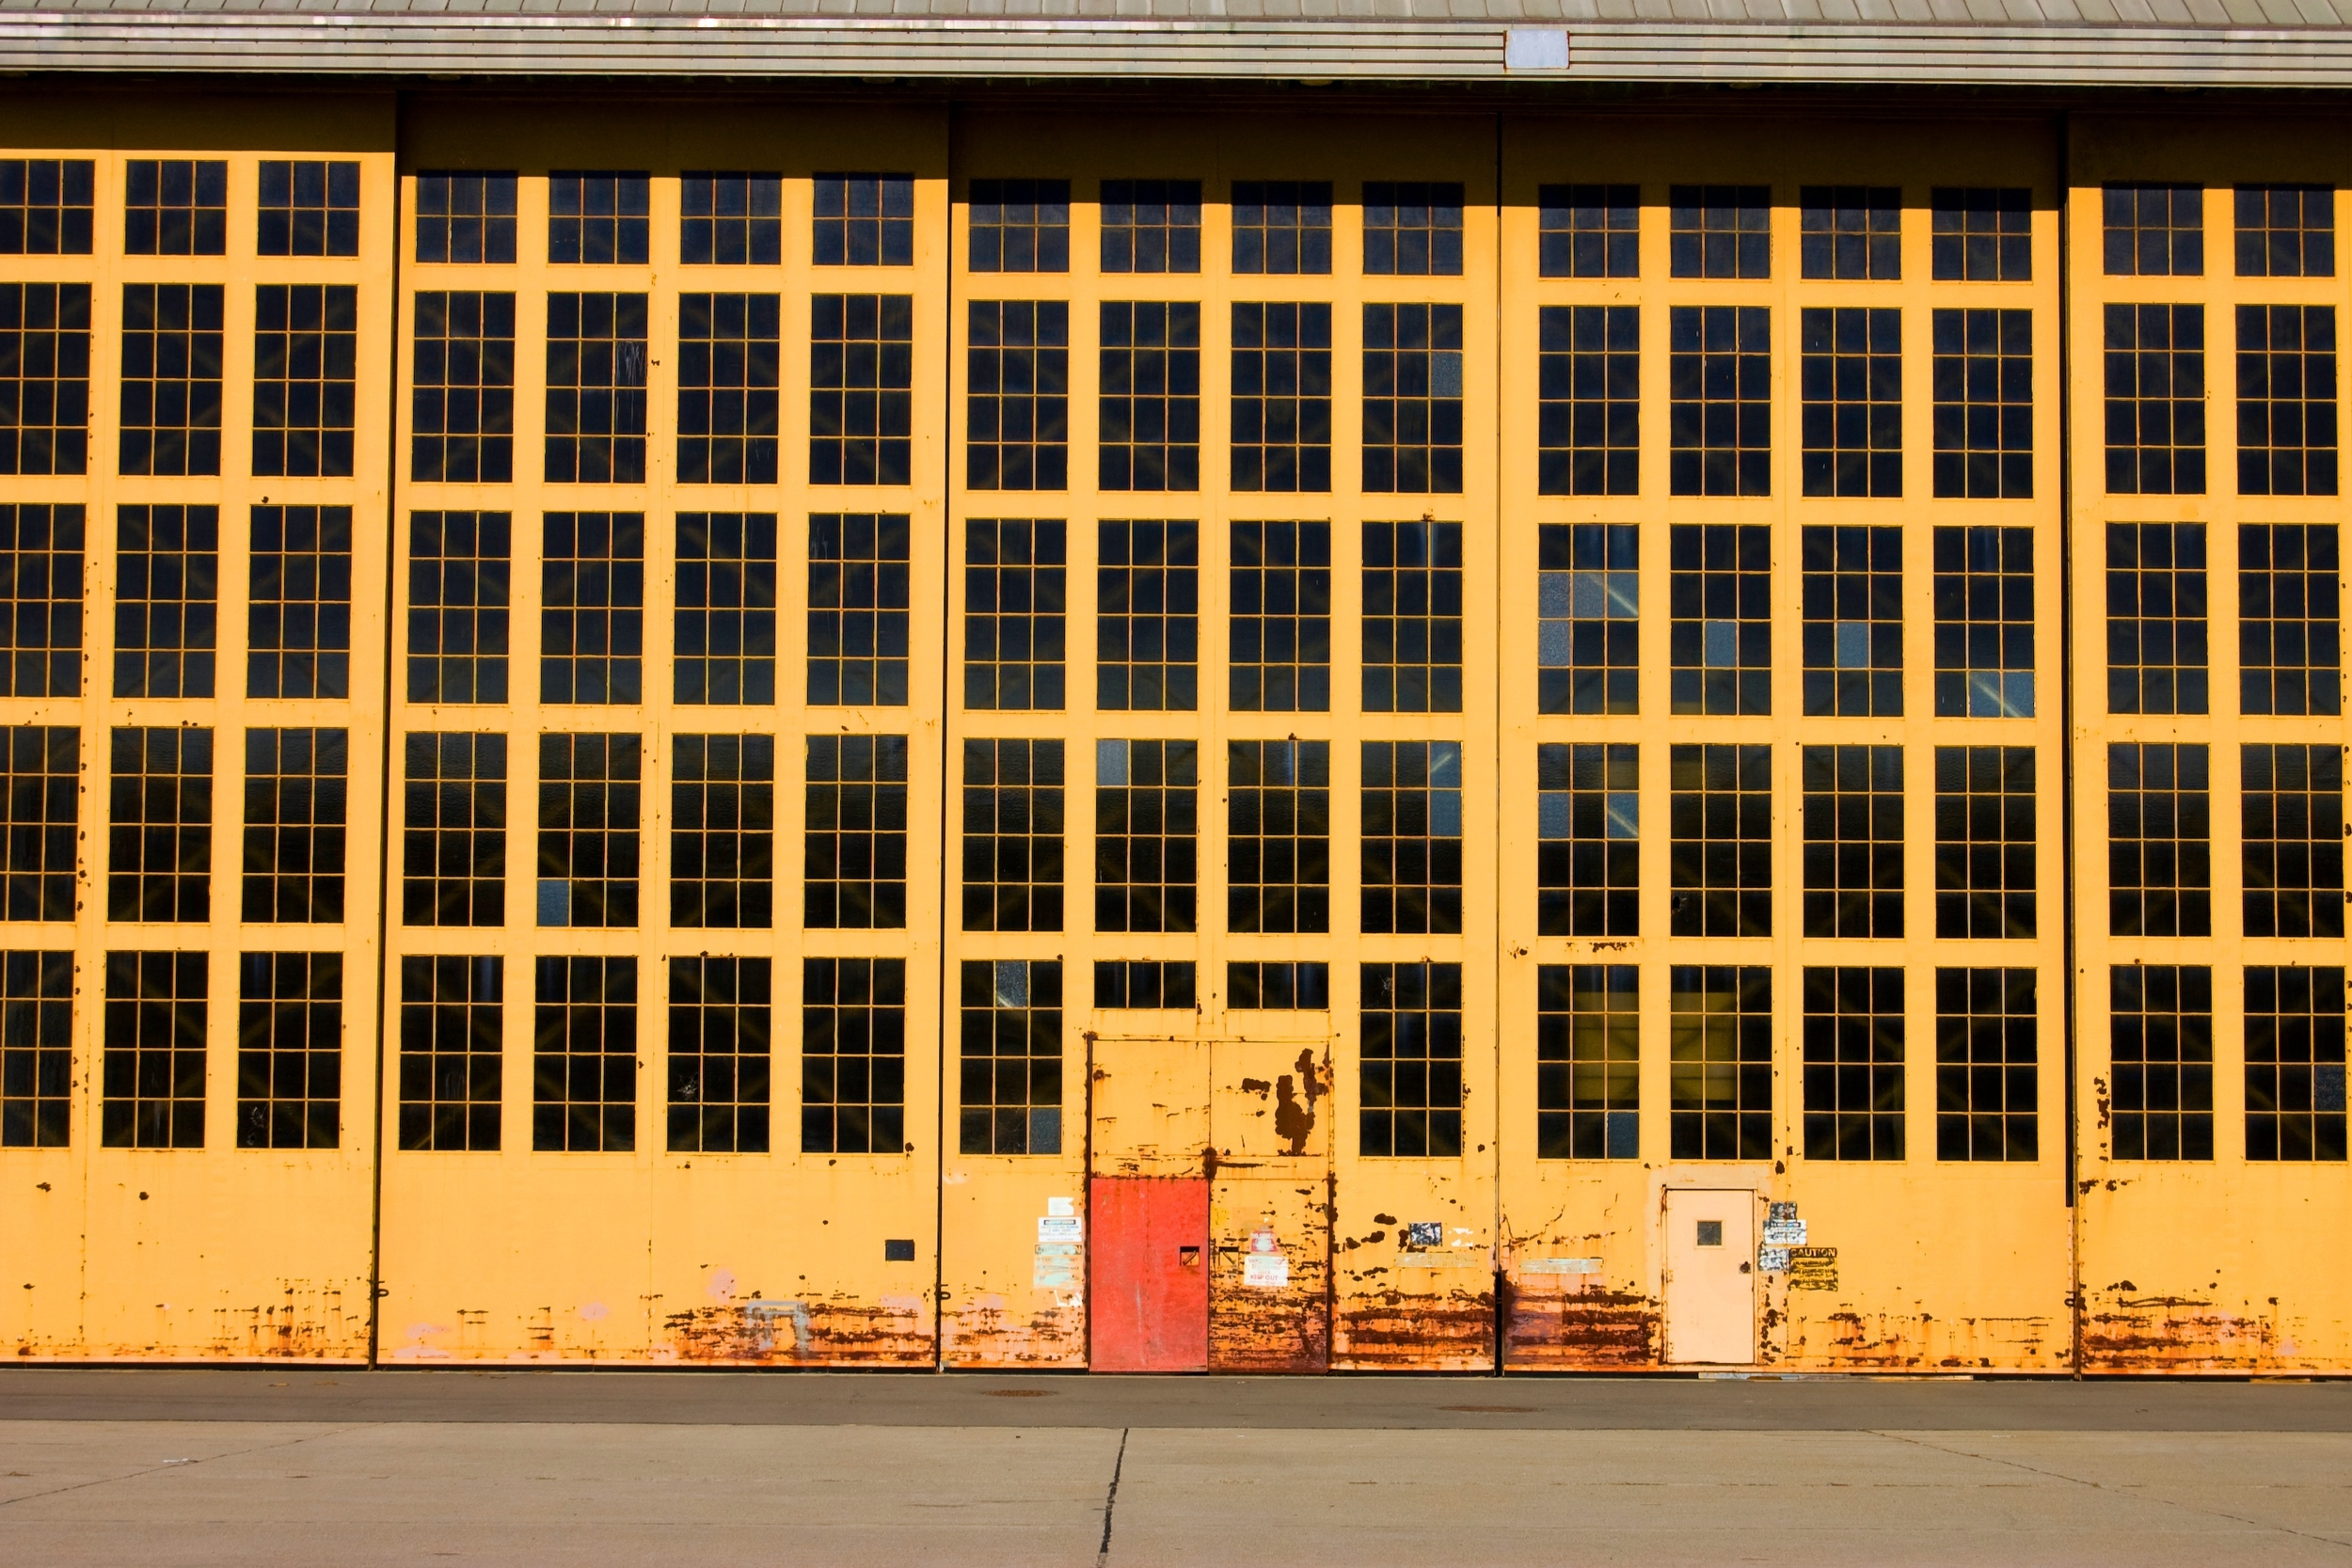 yellow frame windows 18x12-1 - Copy.jpg